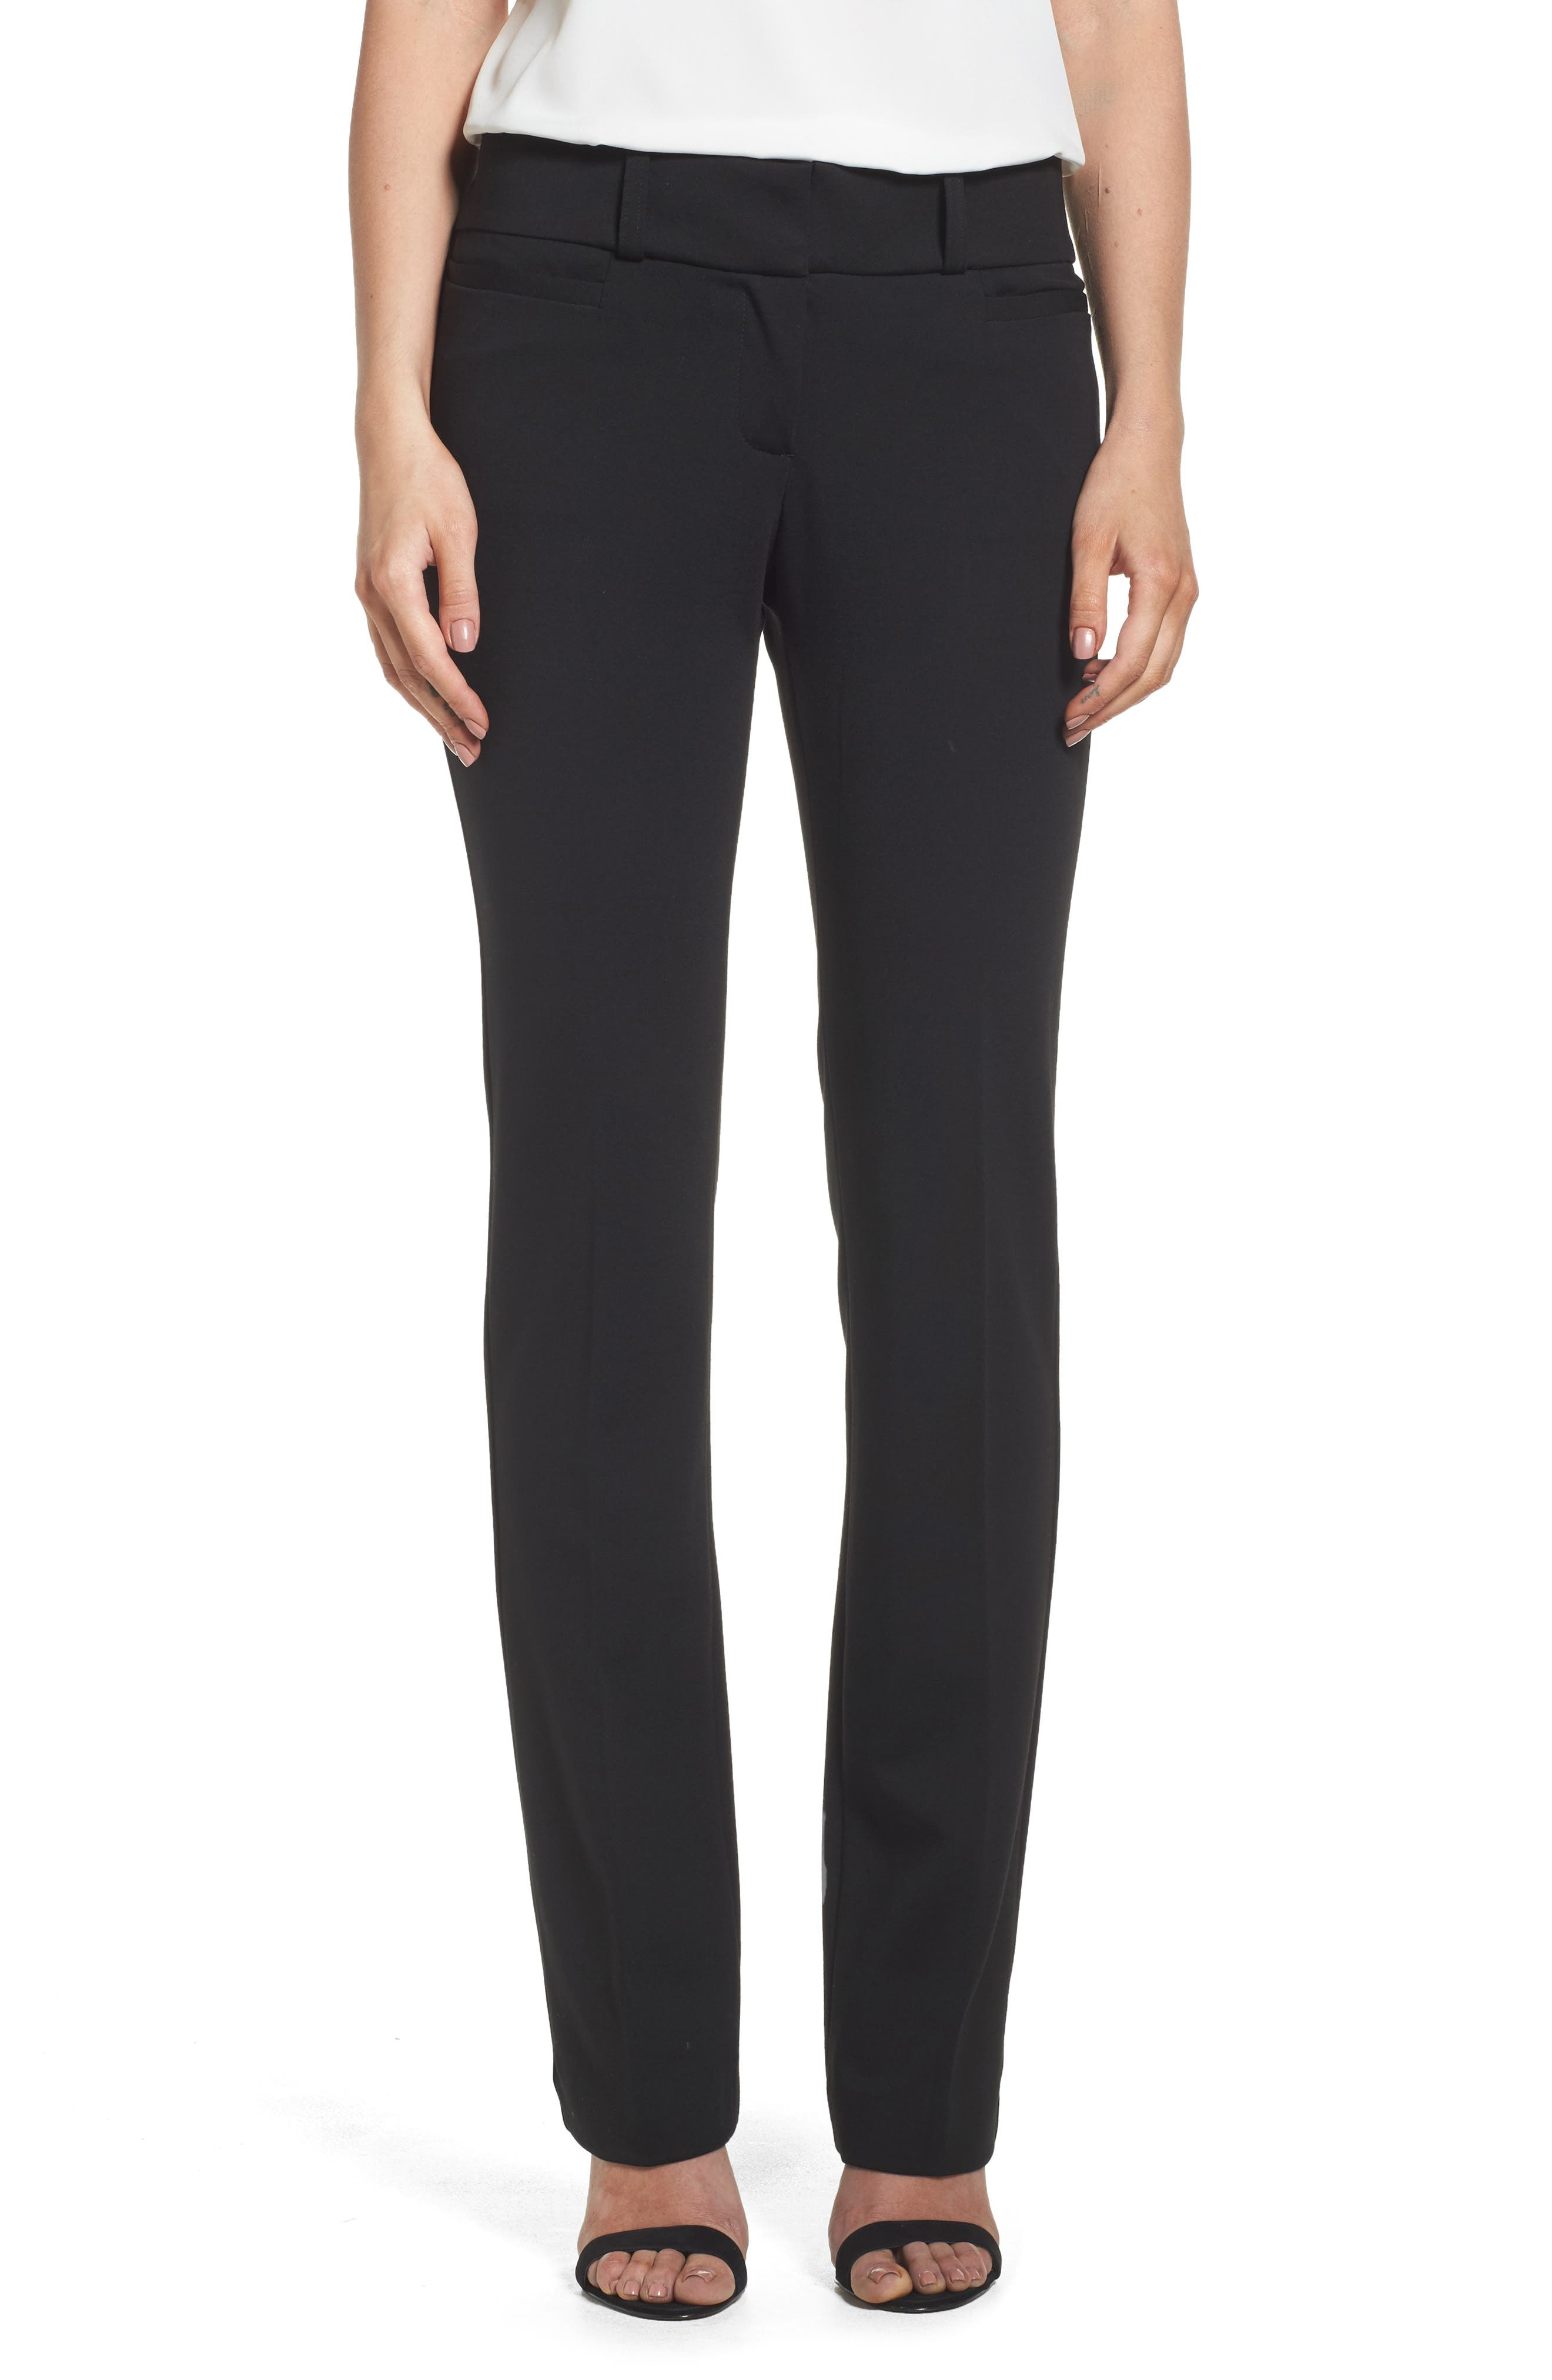 Jane Brown Trousers,                         Main,                         color, Black